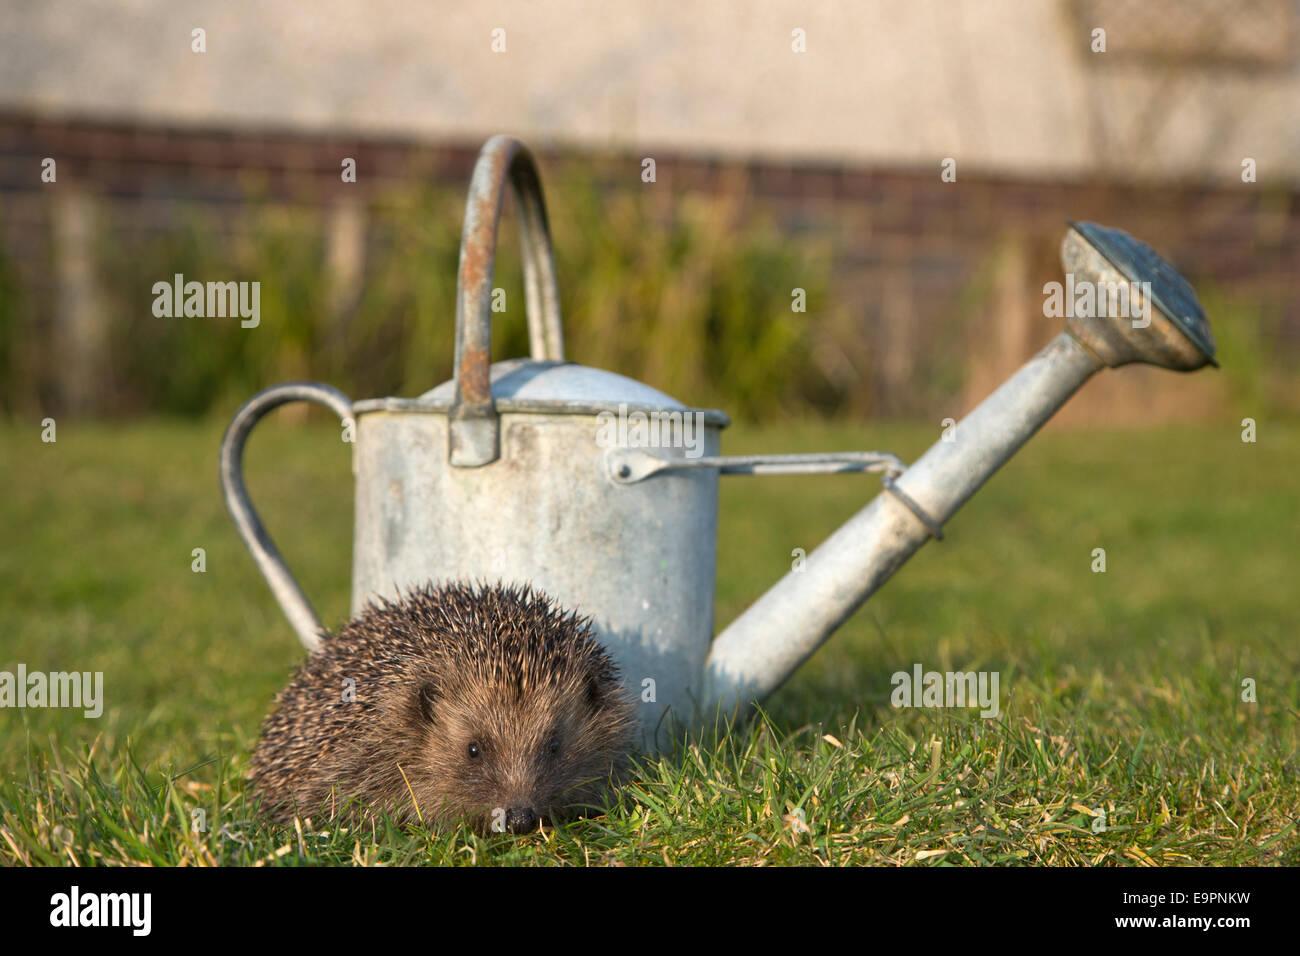 Hedgehog (Erinaceus europaeus), in garden, captive, UK - Stock Image